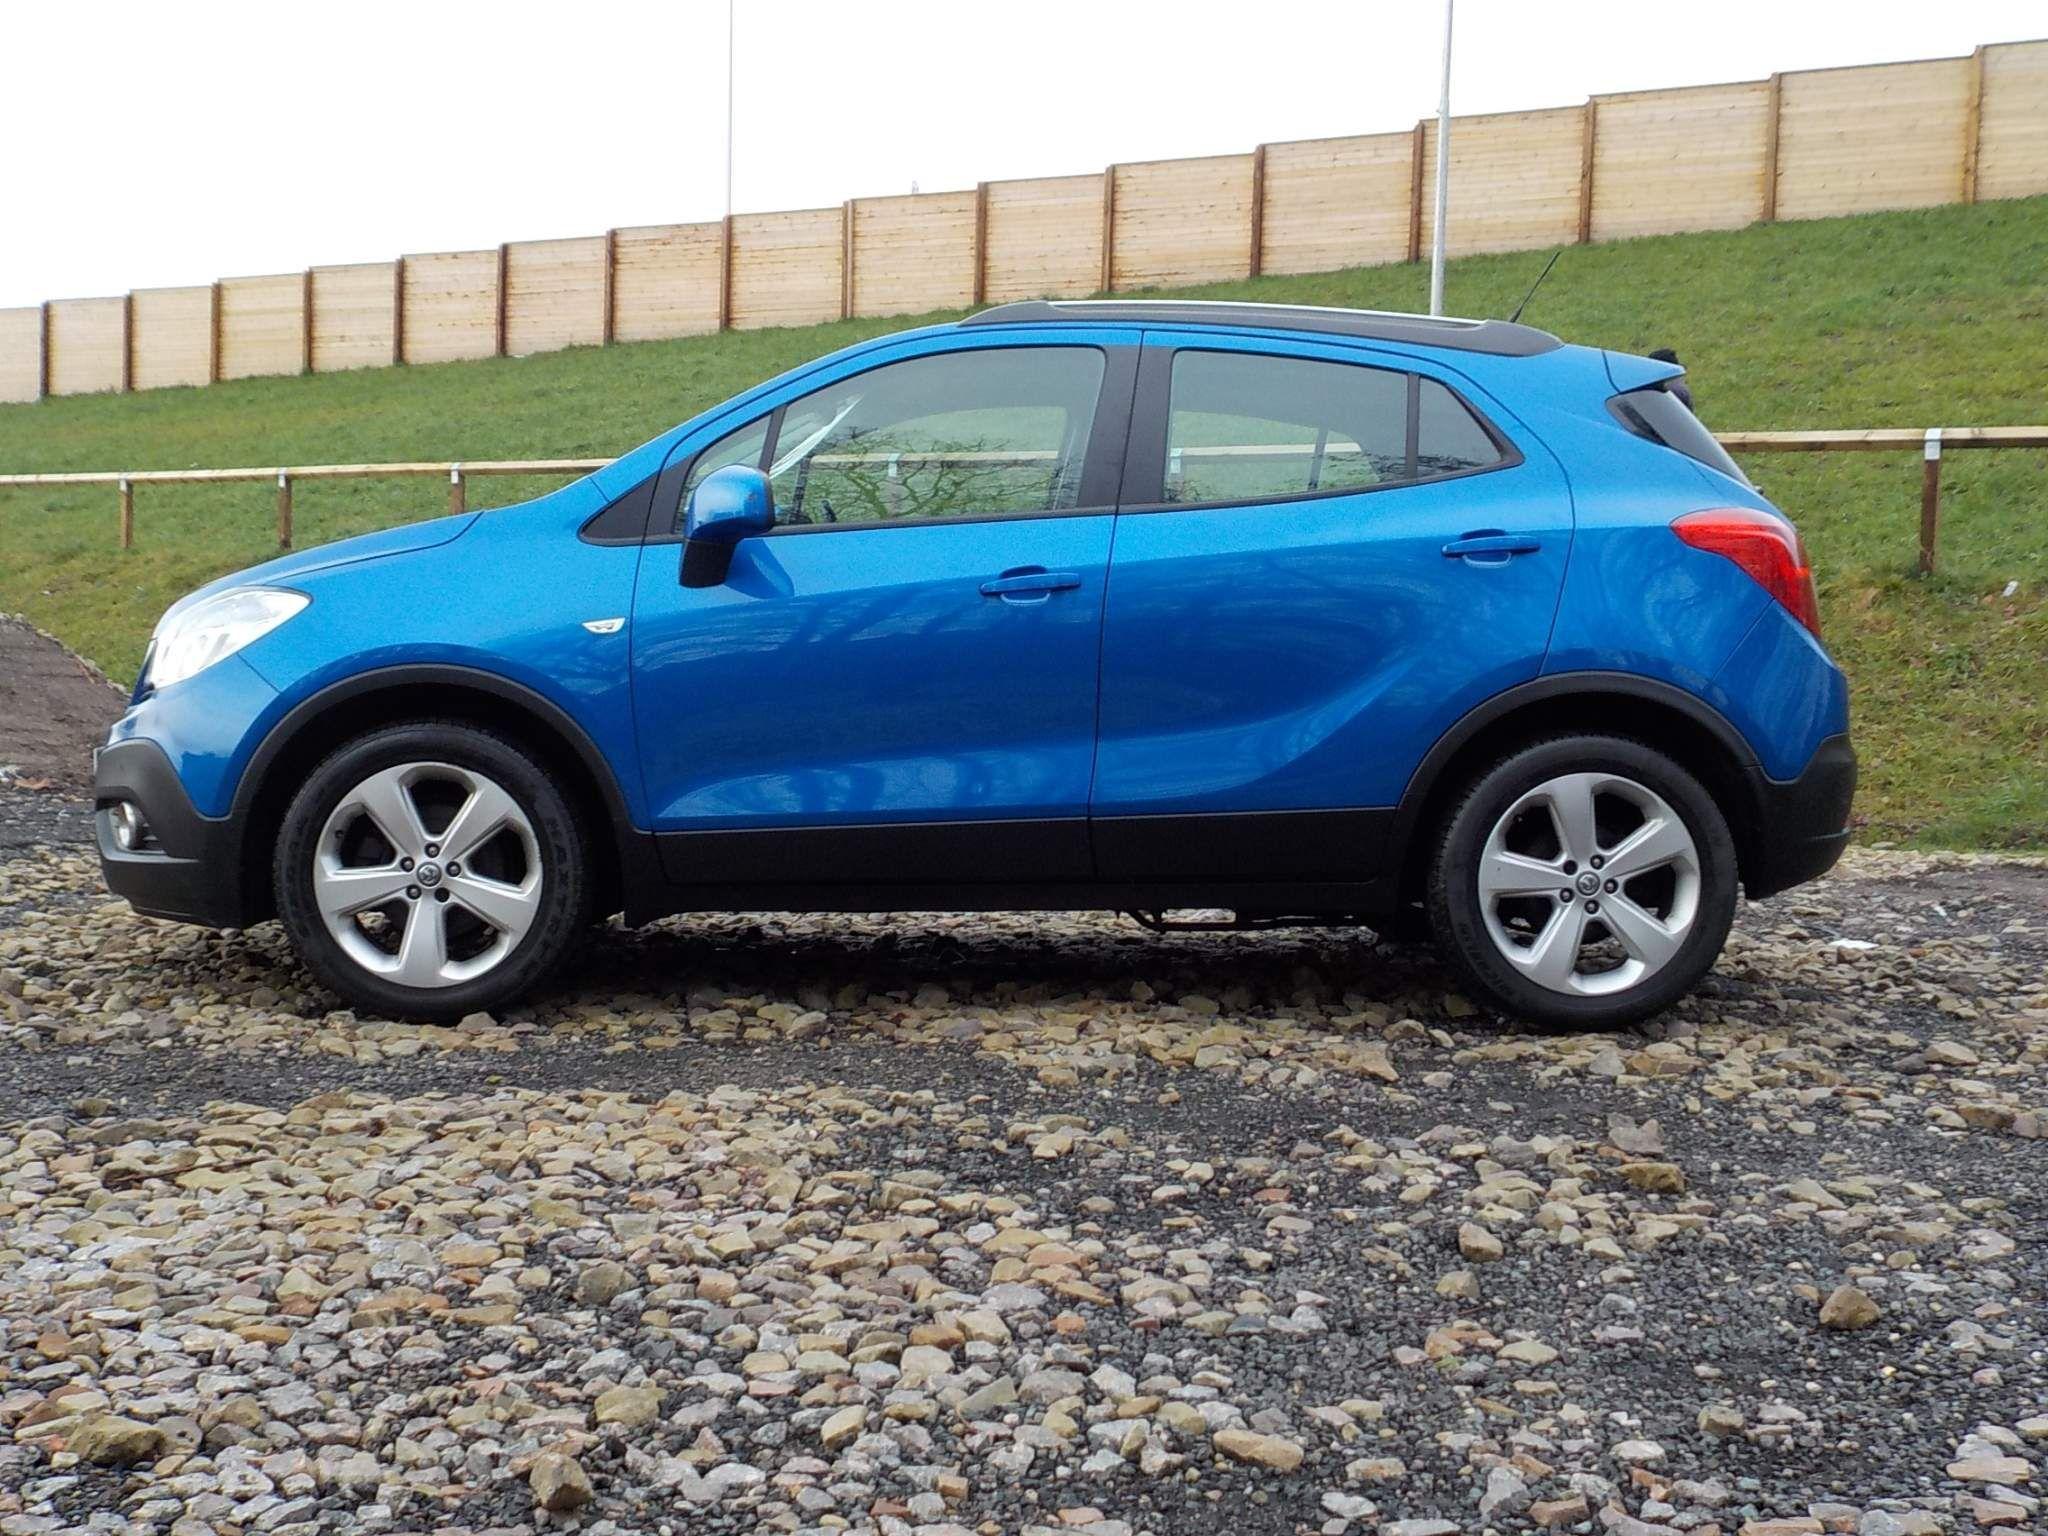 Vauxhall Mokka 1.4 16v Turbo Exclusiv 4x4 (s/s) 5dr